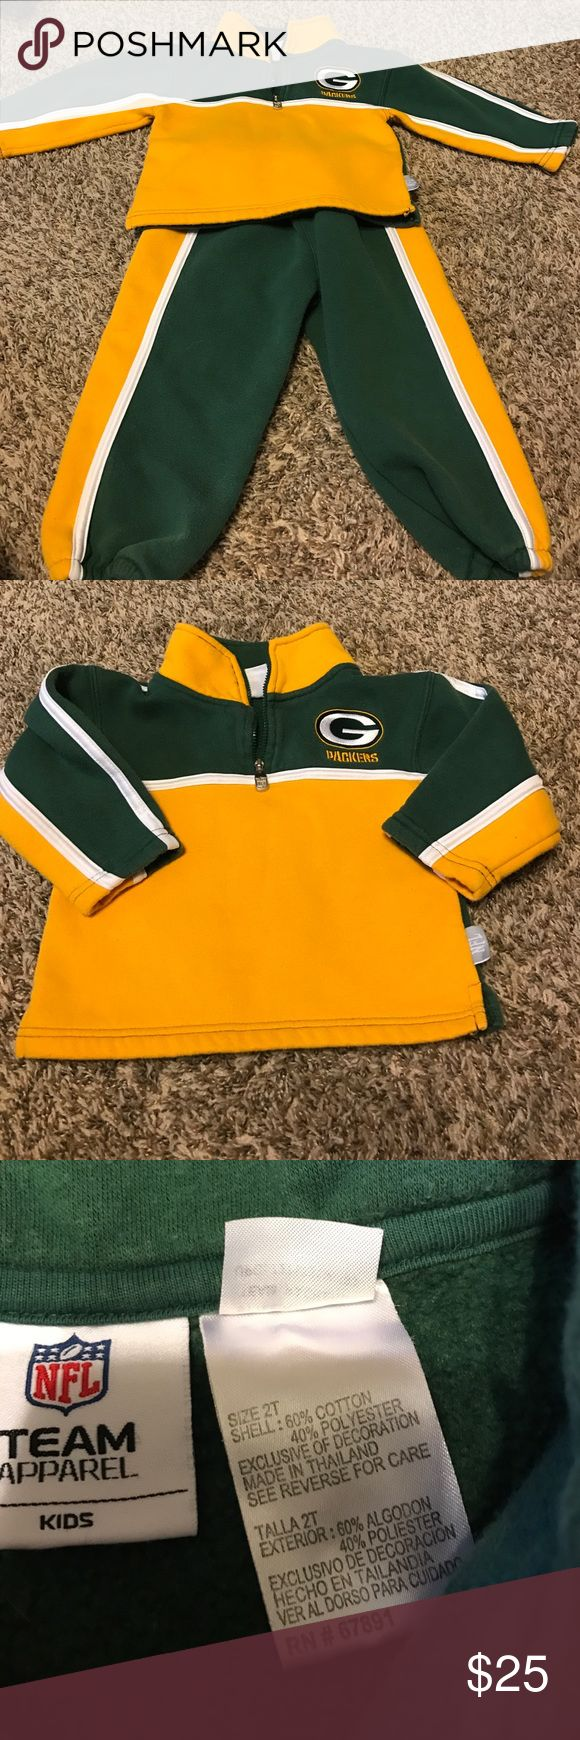 Packers Kids Sweatsuit Packers Kids Sweatsuit, Size 2T, slight peeling, BUNDLE AND SAVE $$$ Make an Offer!!! NFL Matching Sets